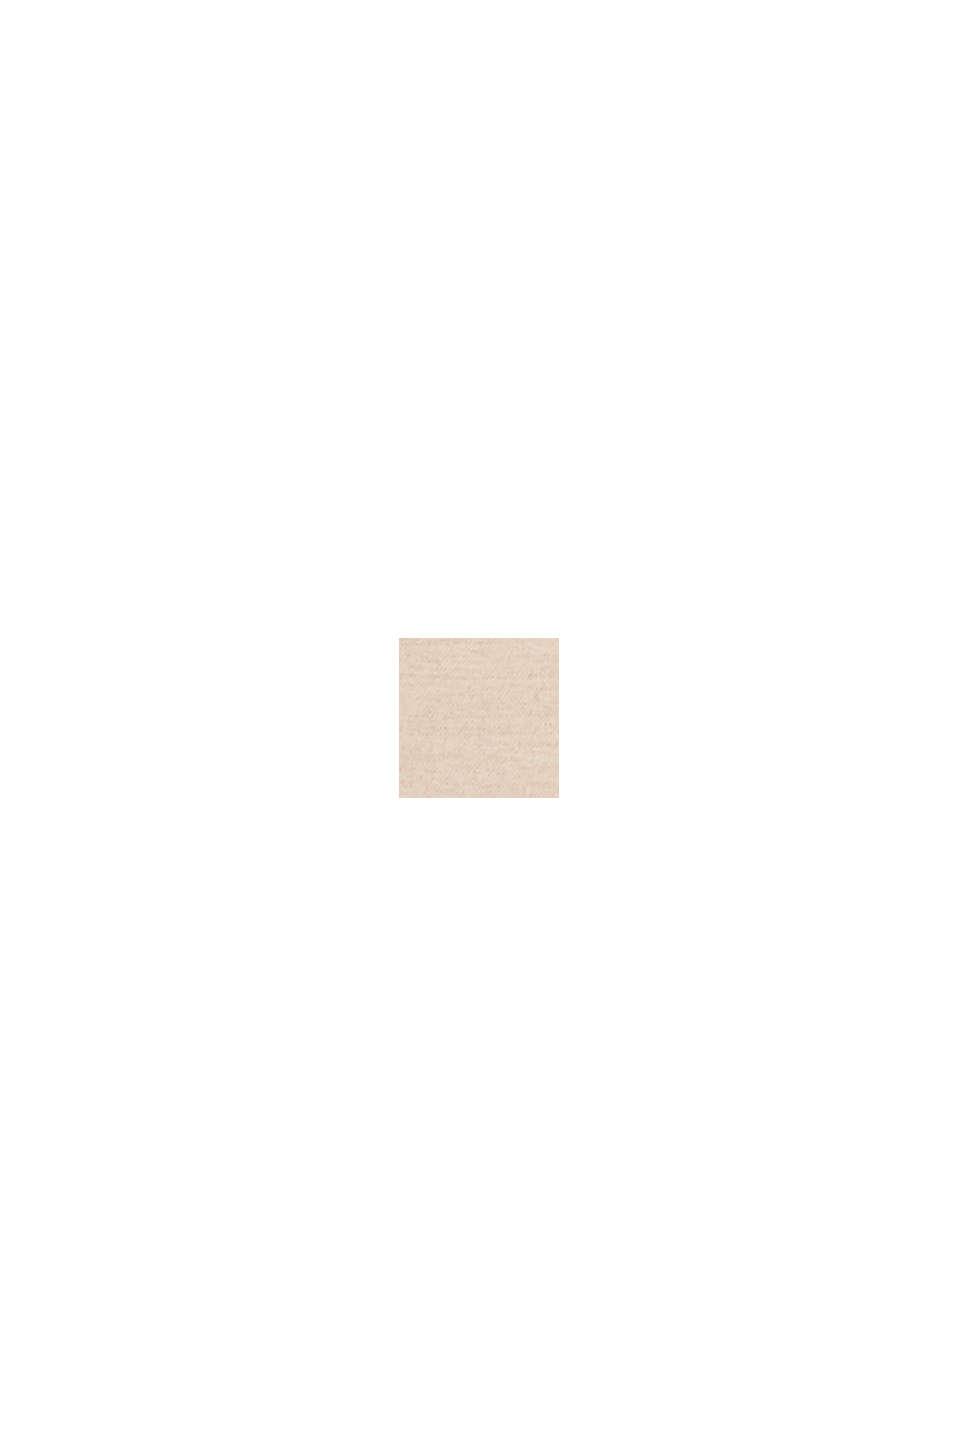 Culottebyxa i flanell med bred linning, LIGHT TAUPE, swatch